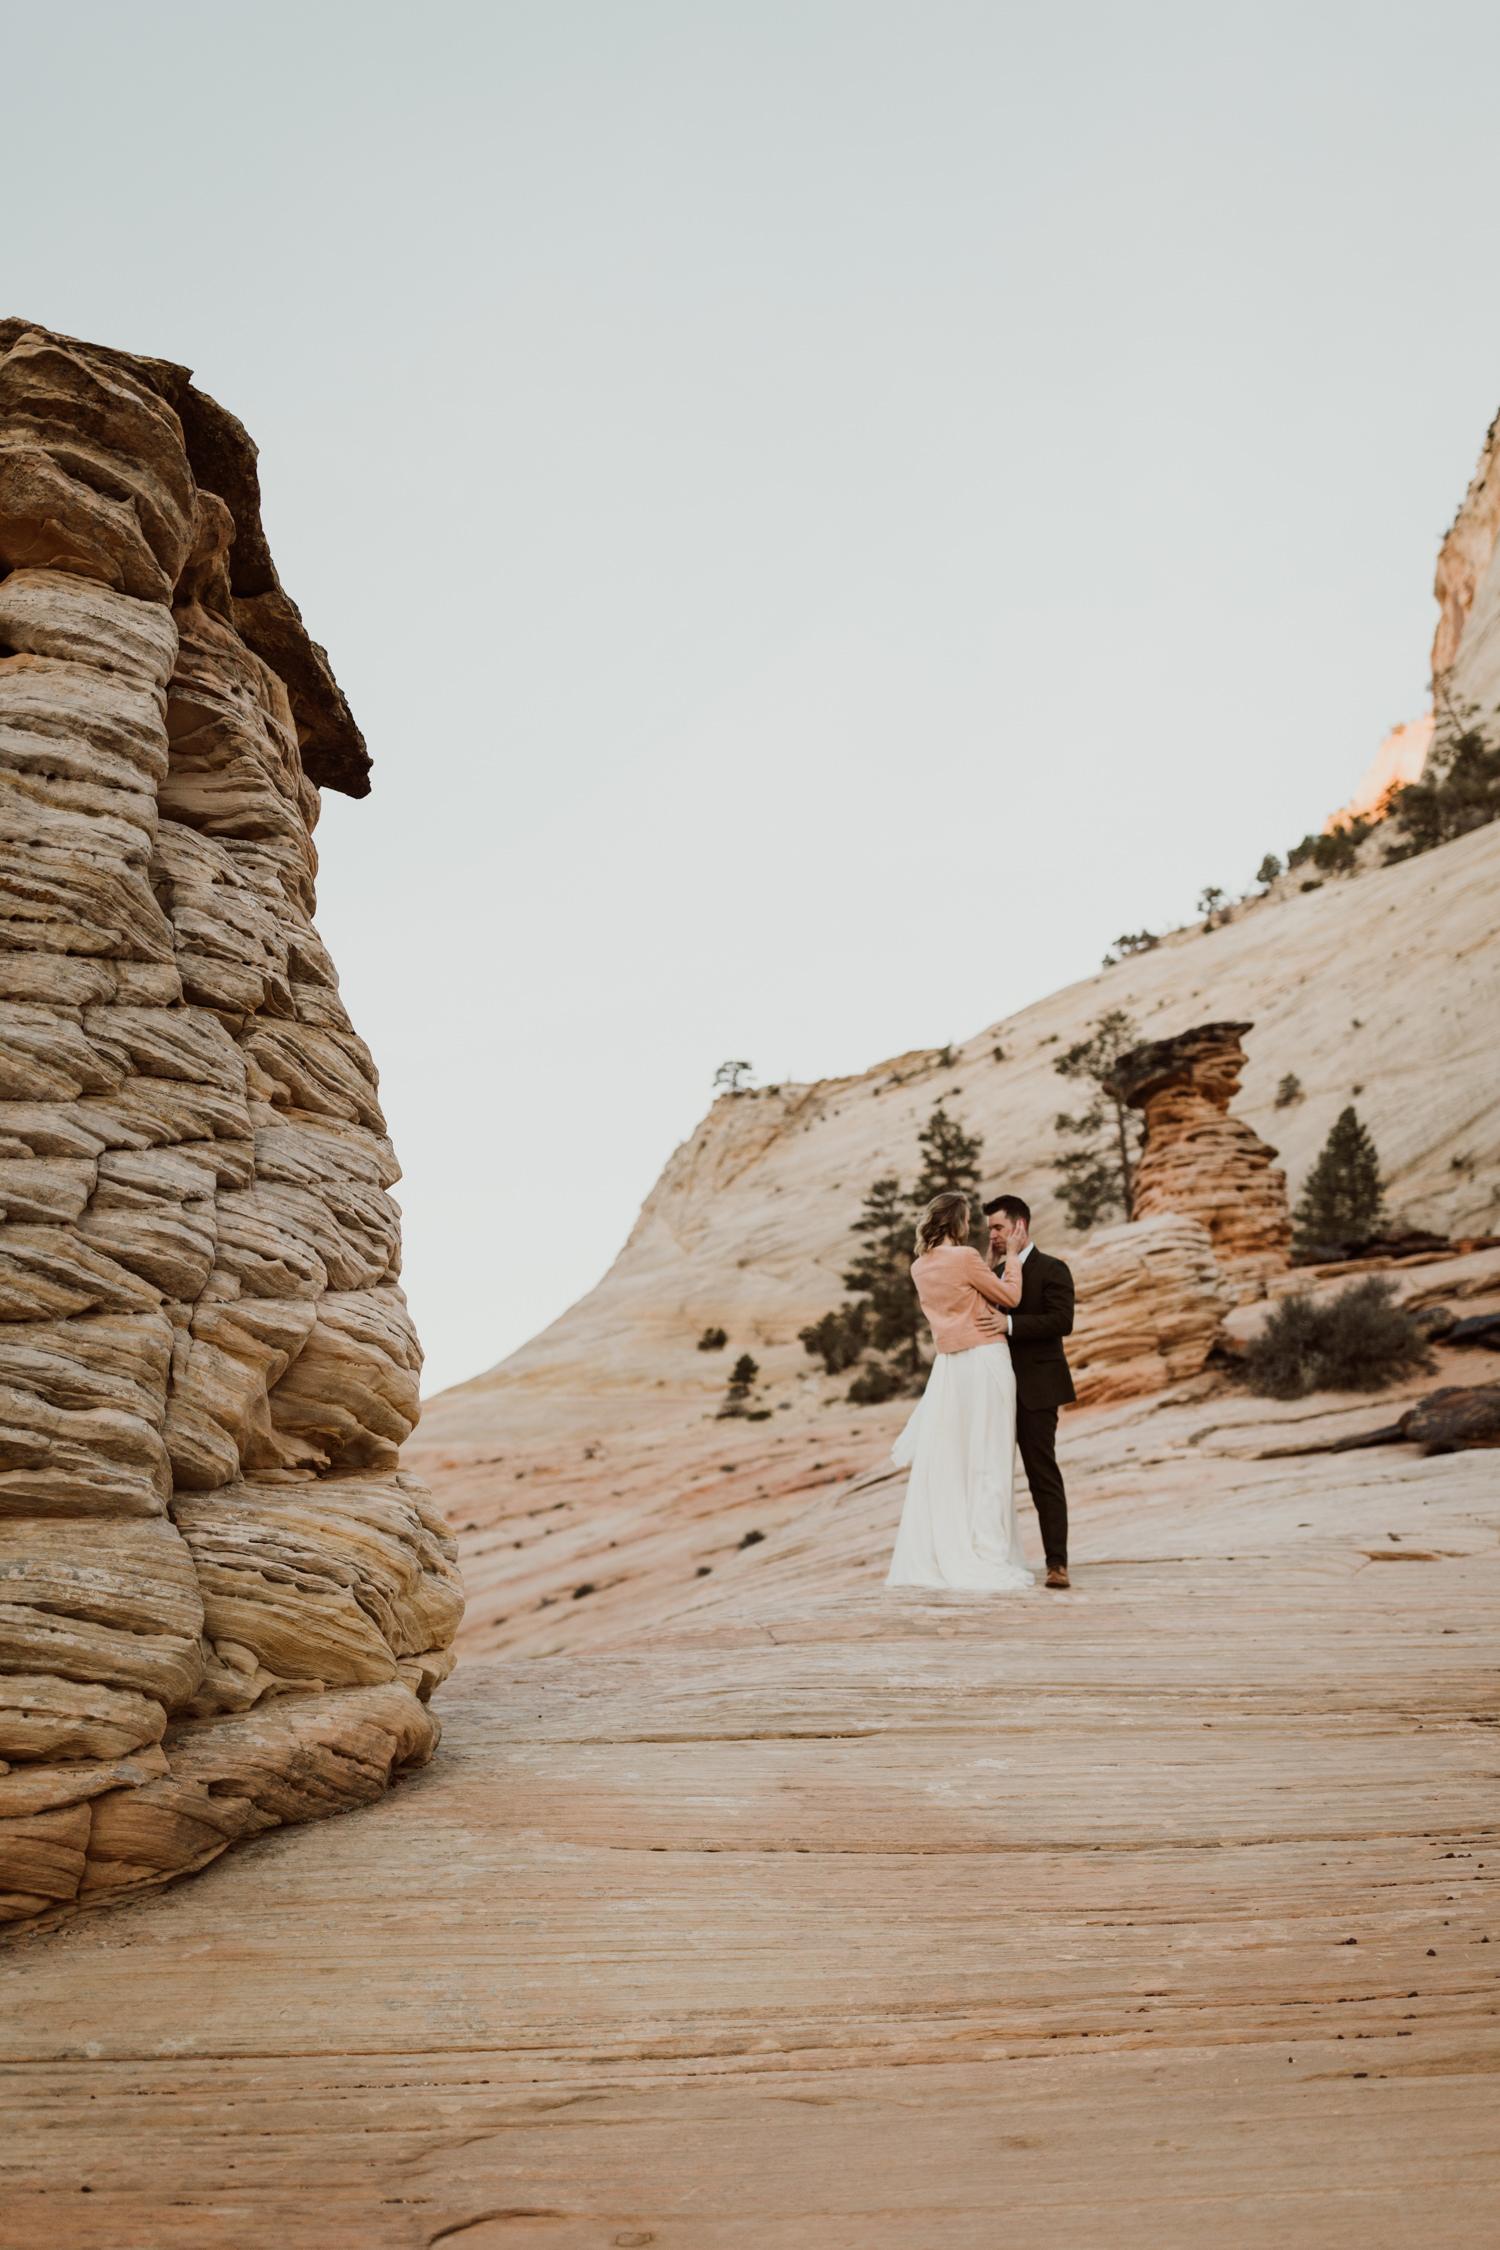 zion-national-park-wedding-36.jpg